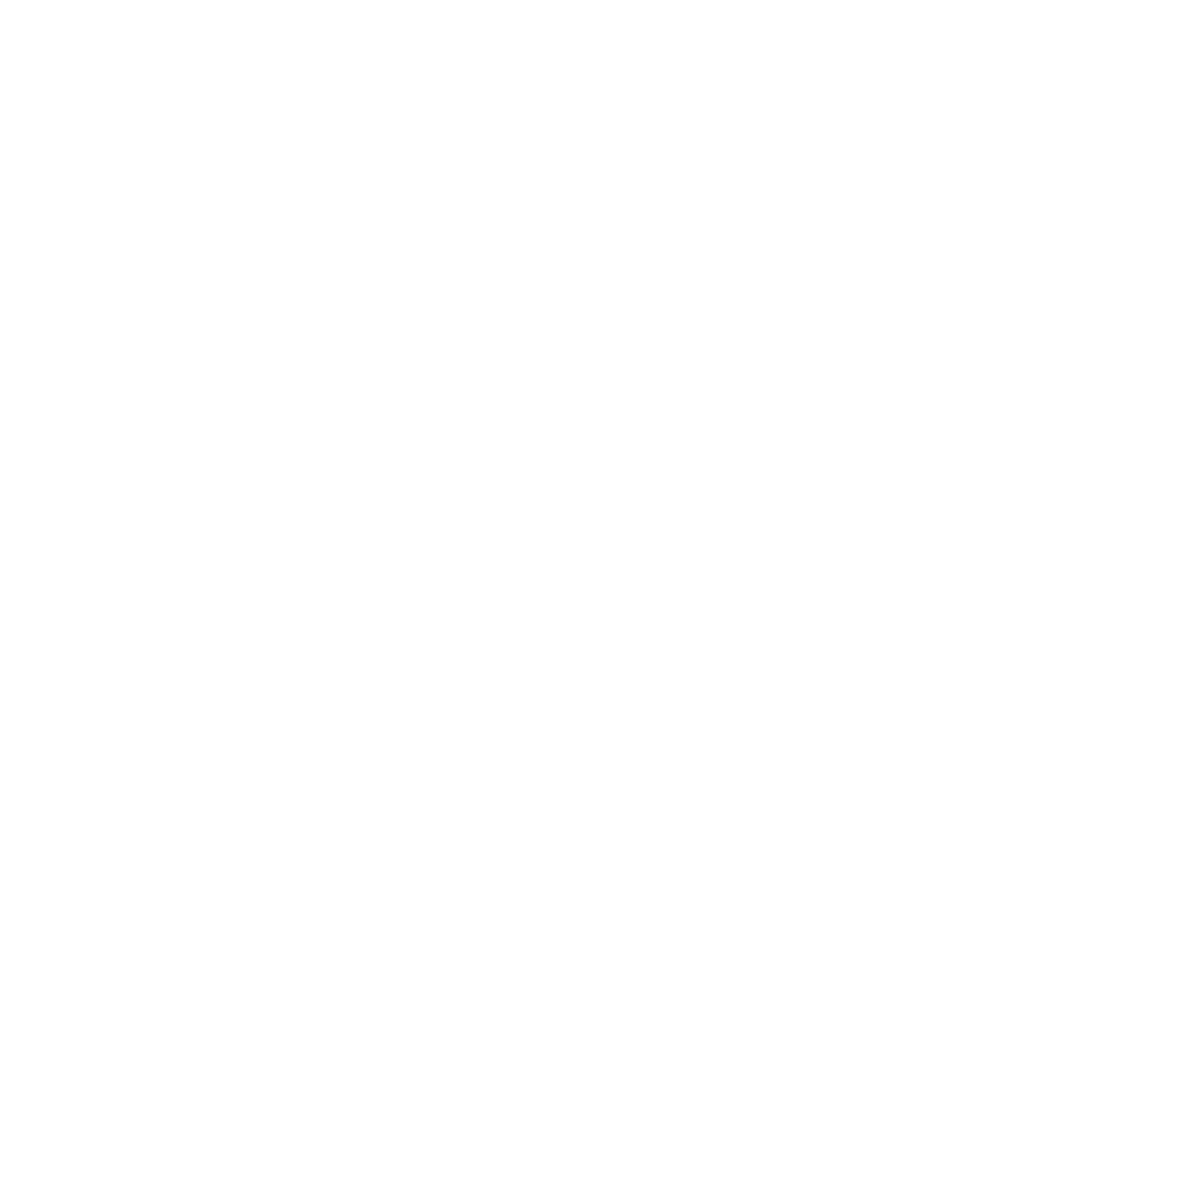 Maine Girl Massage